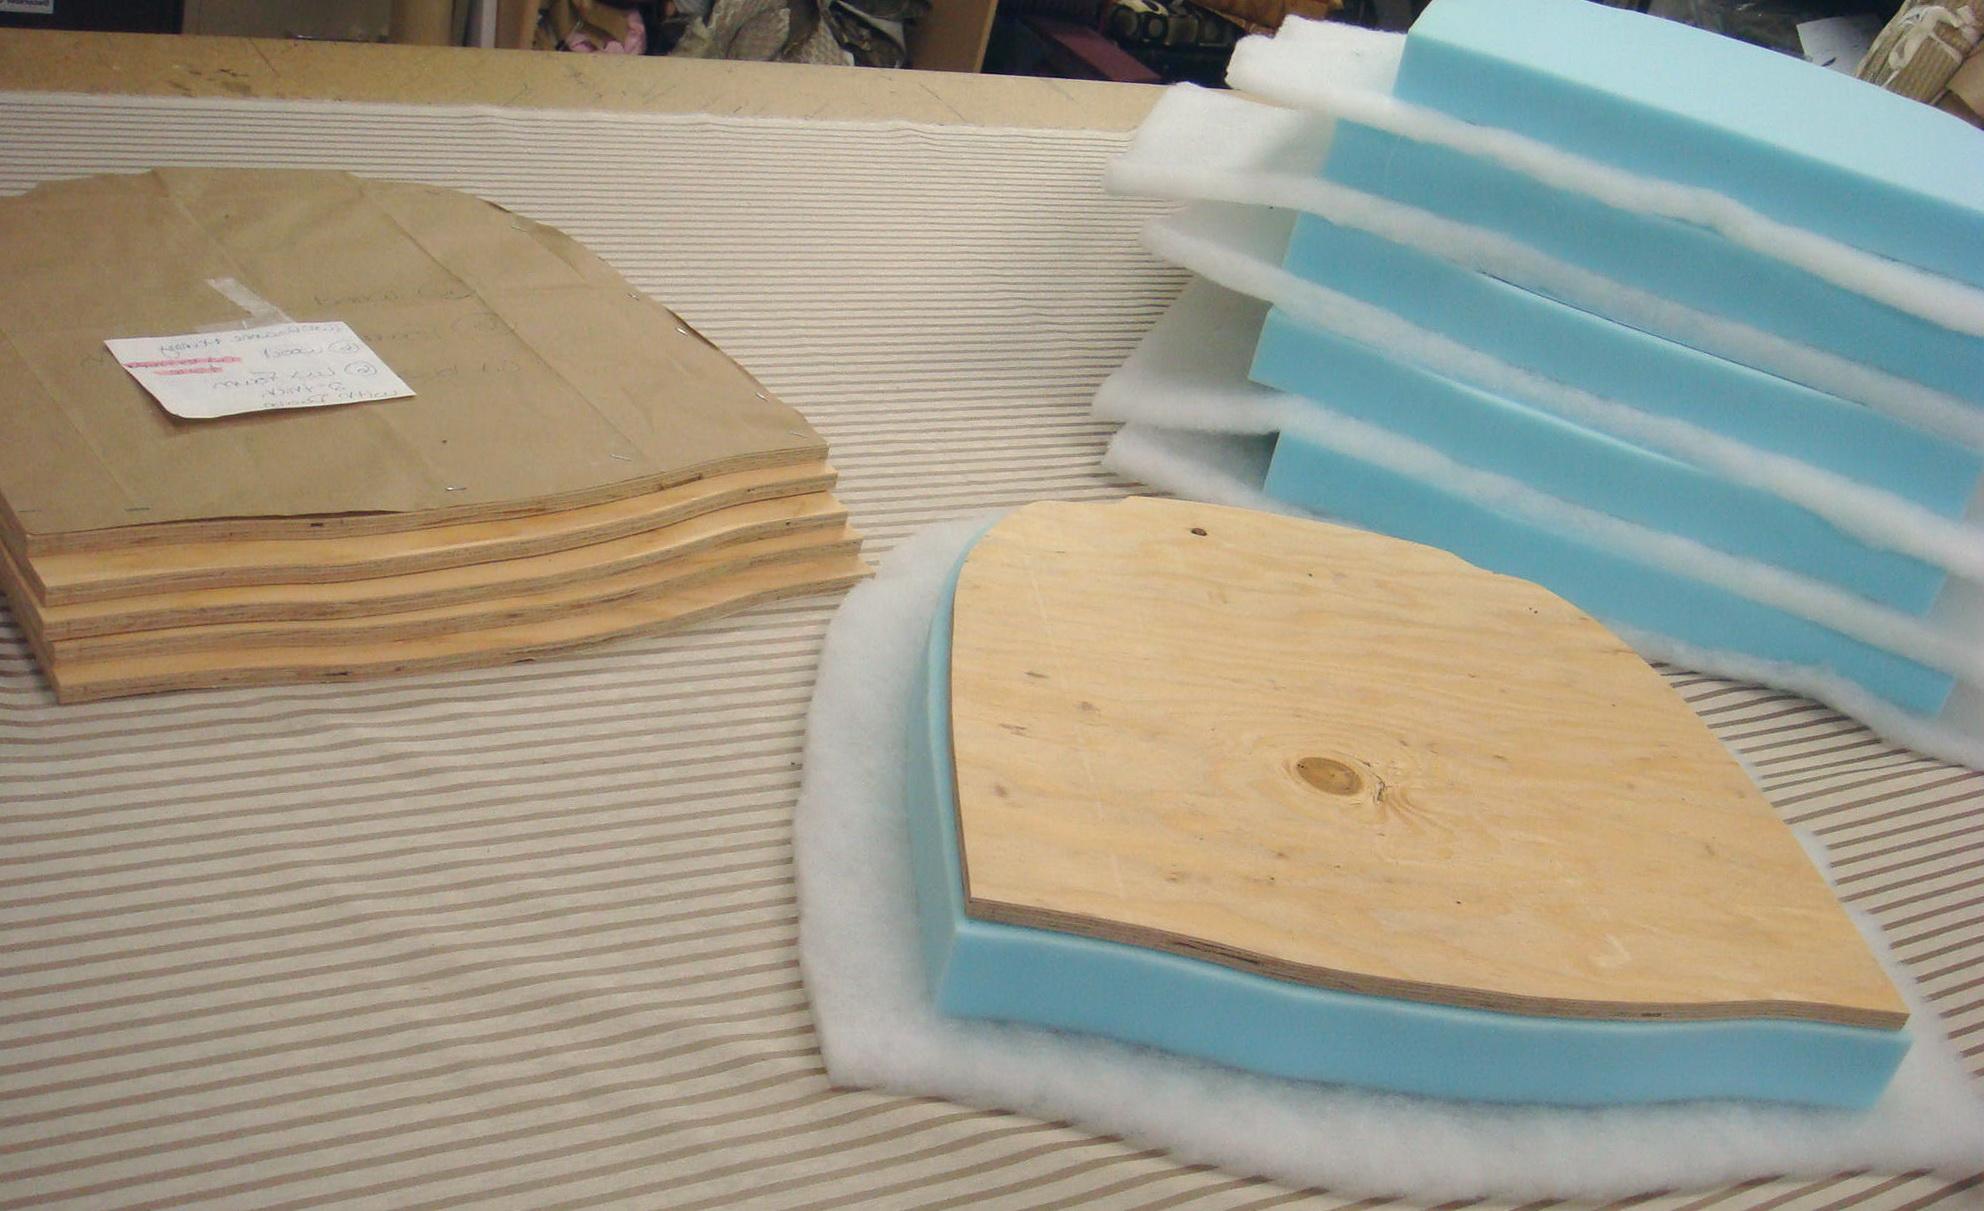 Foam Chair Cushions Replacement  Home Design Ideas